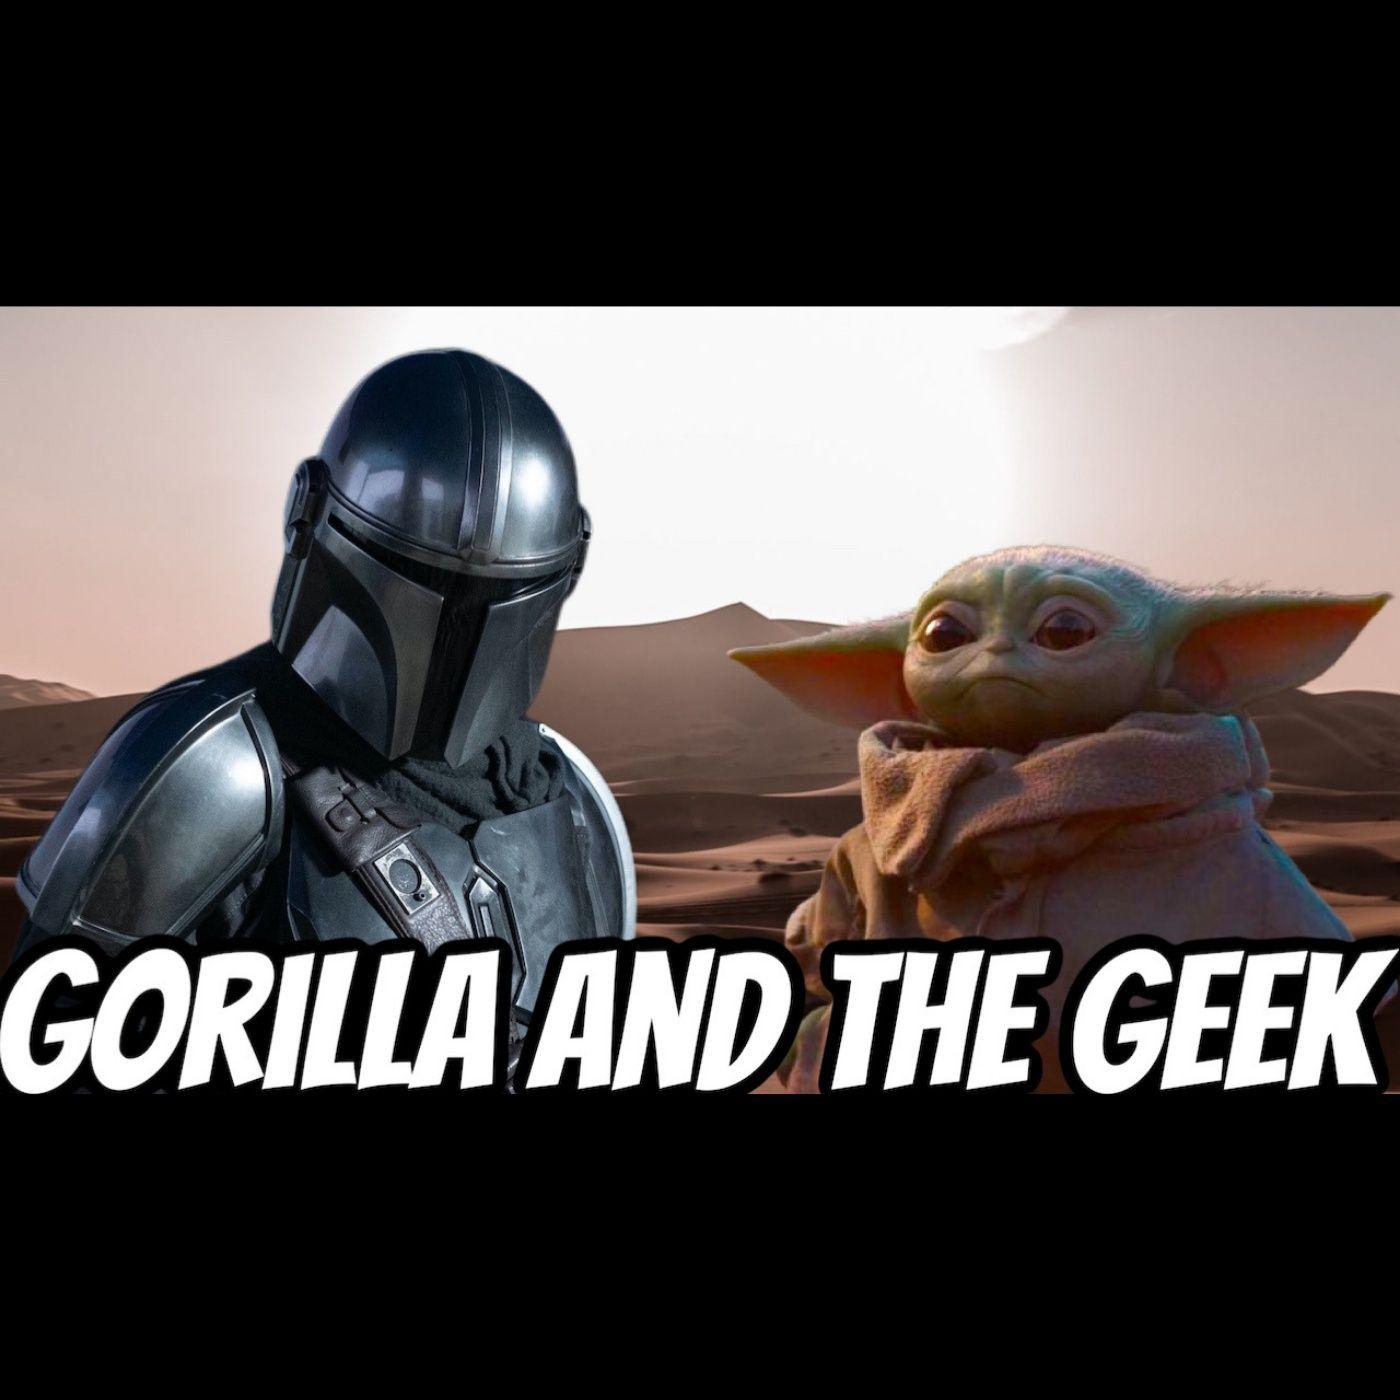 The Mandalorian Season 1 Discussion - Gorilla and The Geek Episode 34